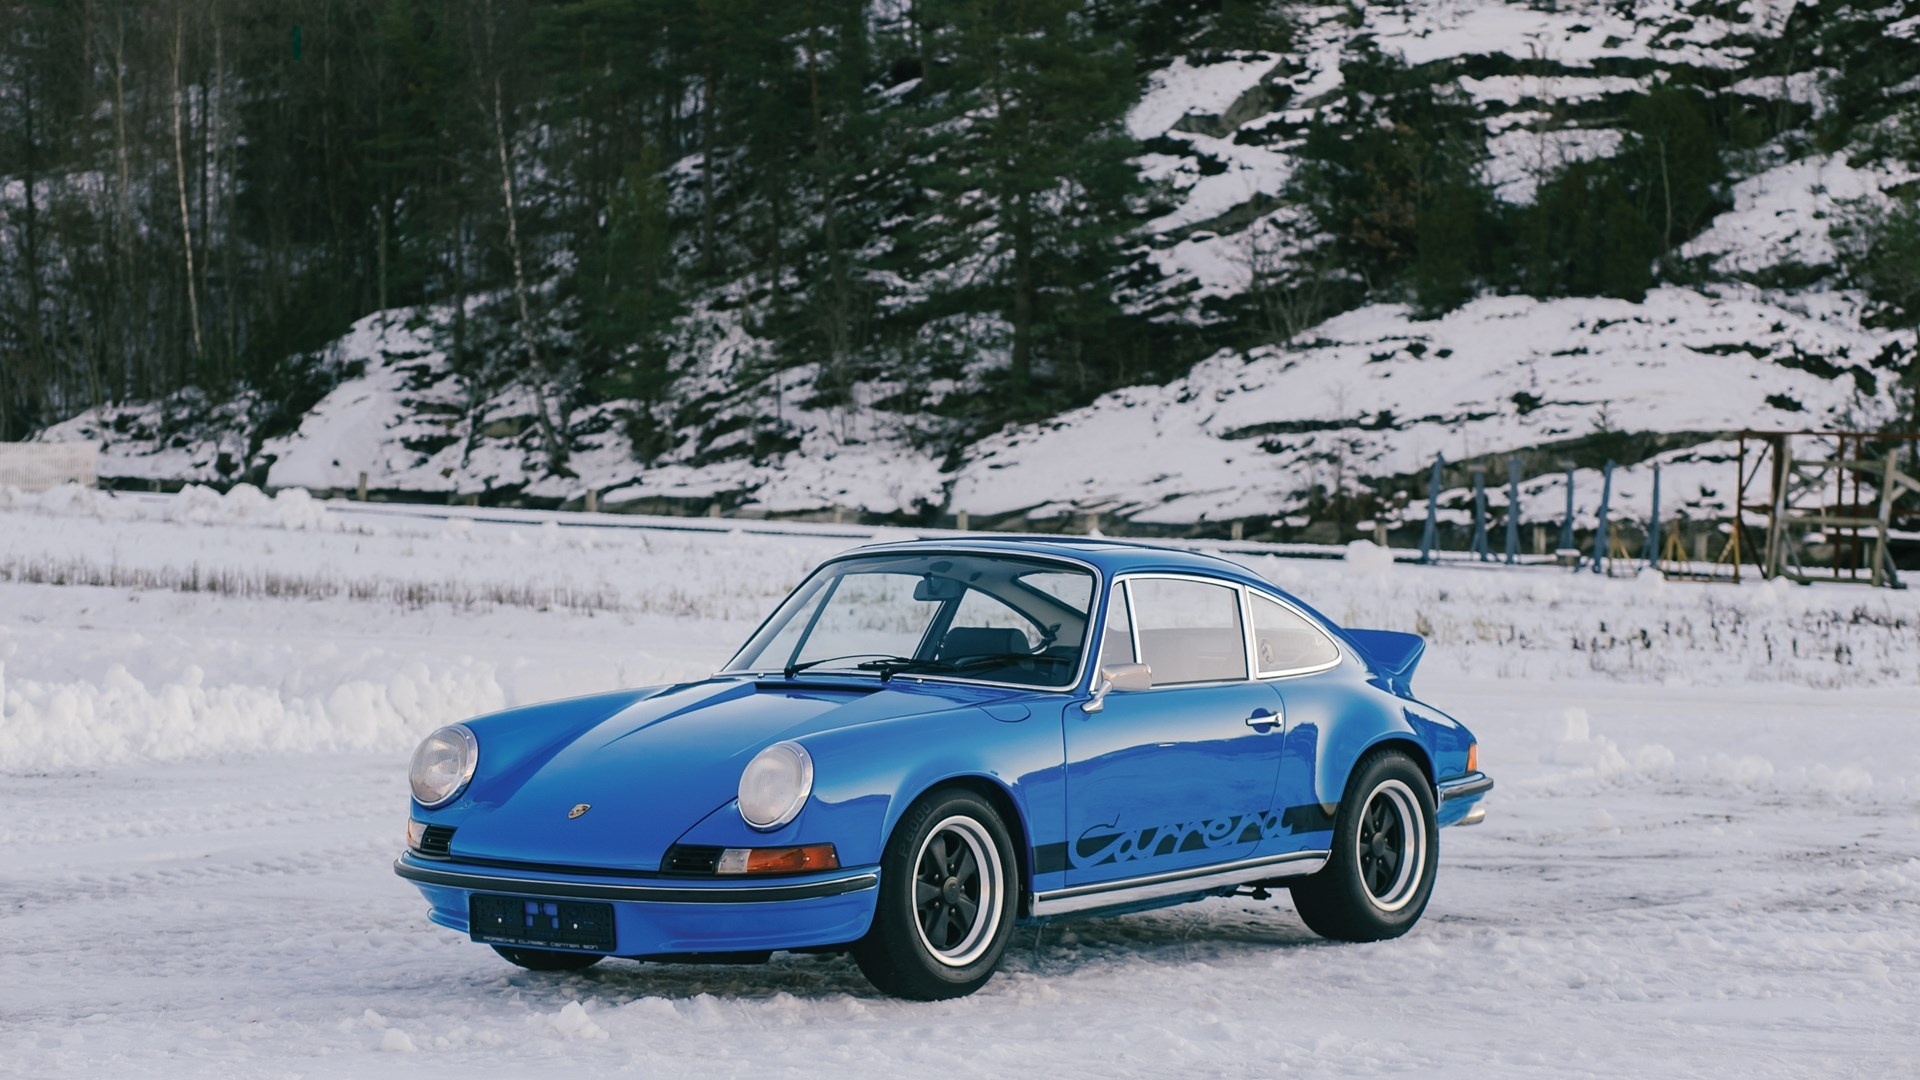 1973 Porsche 911 Carrera Rs 2 7 Touring Classic Driver Market